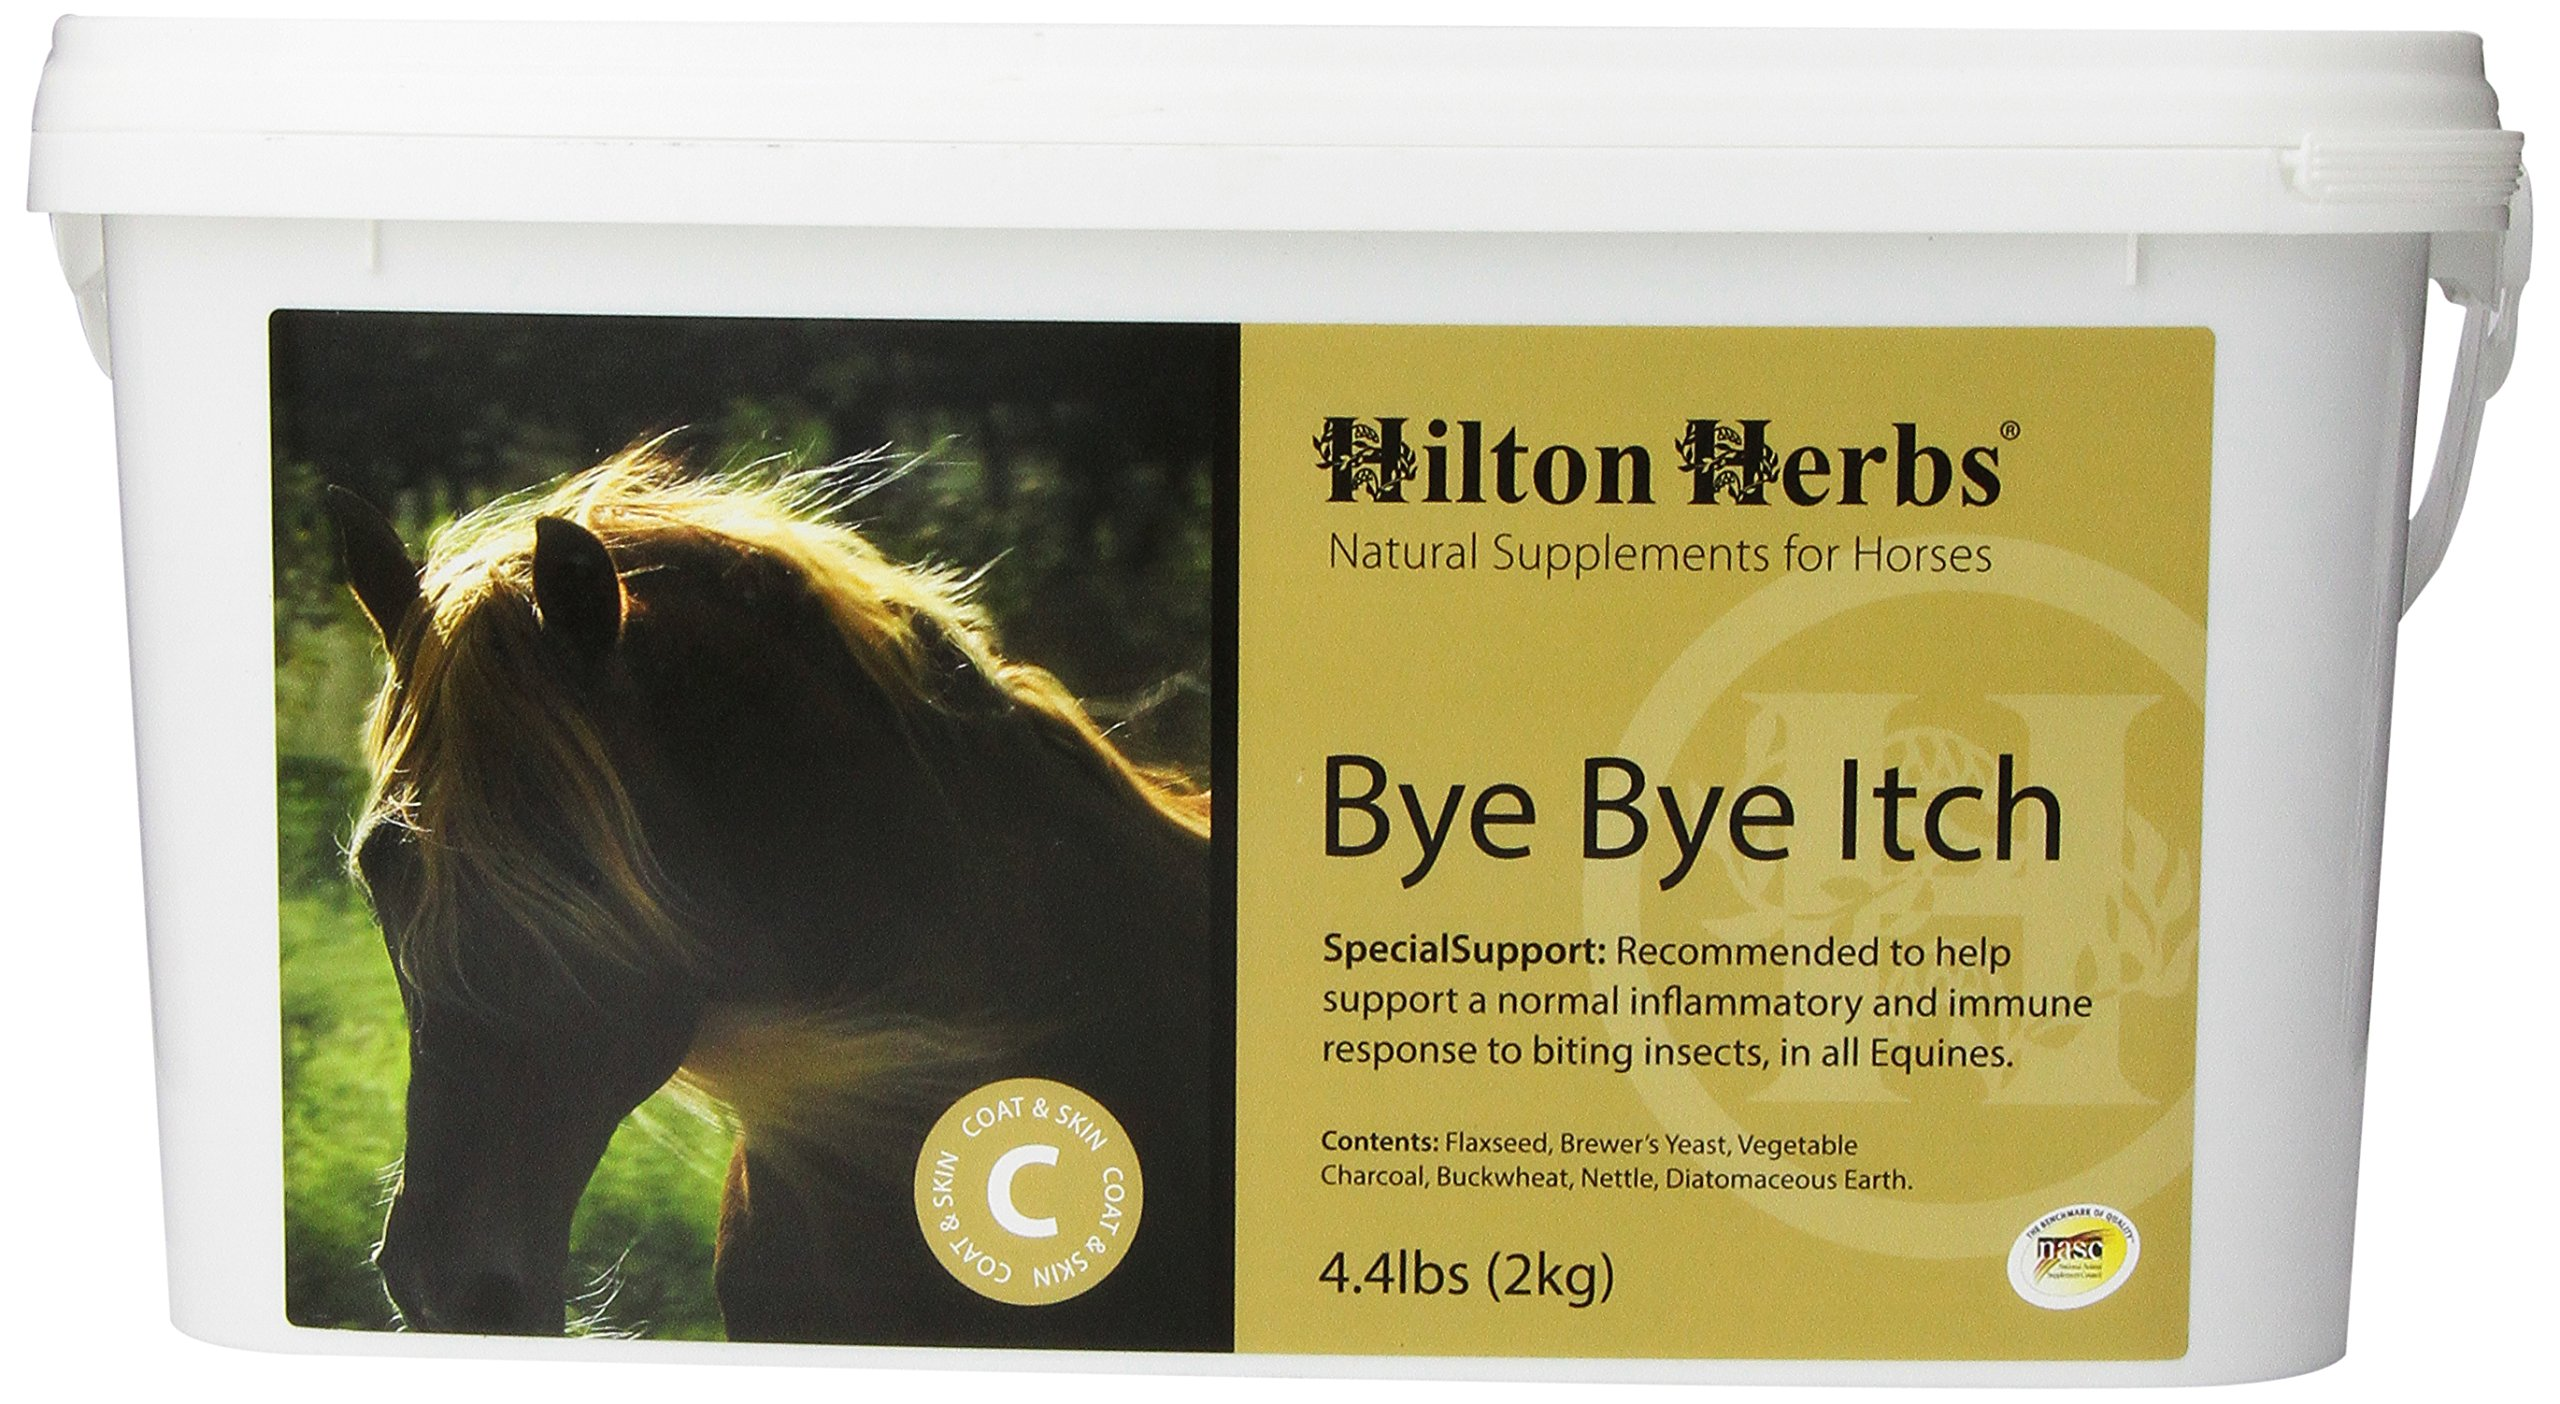 Hilton Herbs Bye Bye Itch Seasonal Skin Allergy Supplement for Horses, 2kg Tub by Hilton Herbs